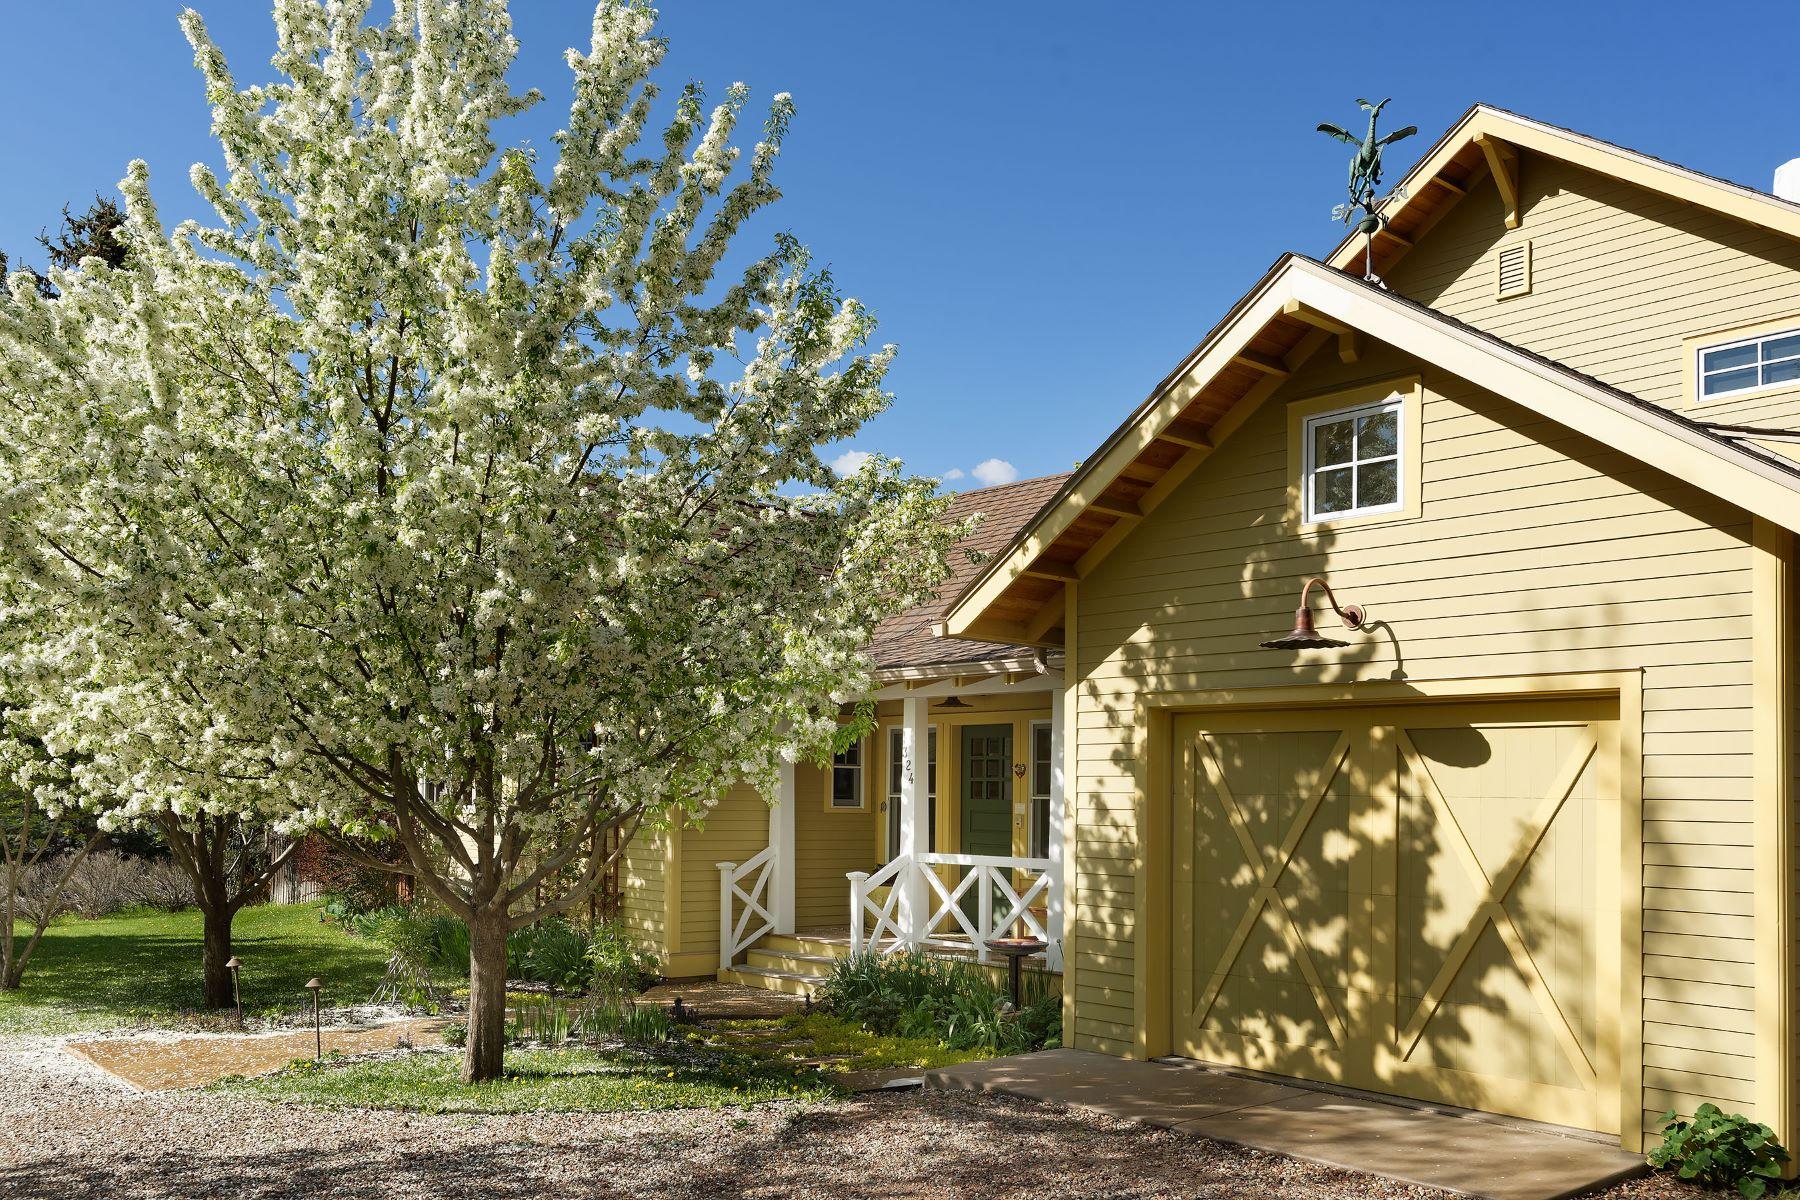 Single Family Homes for Active at Basalt Treasure 324 E Sopris Drive Basalt, Colorado 81621 United States